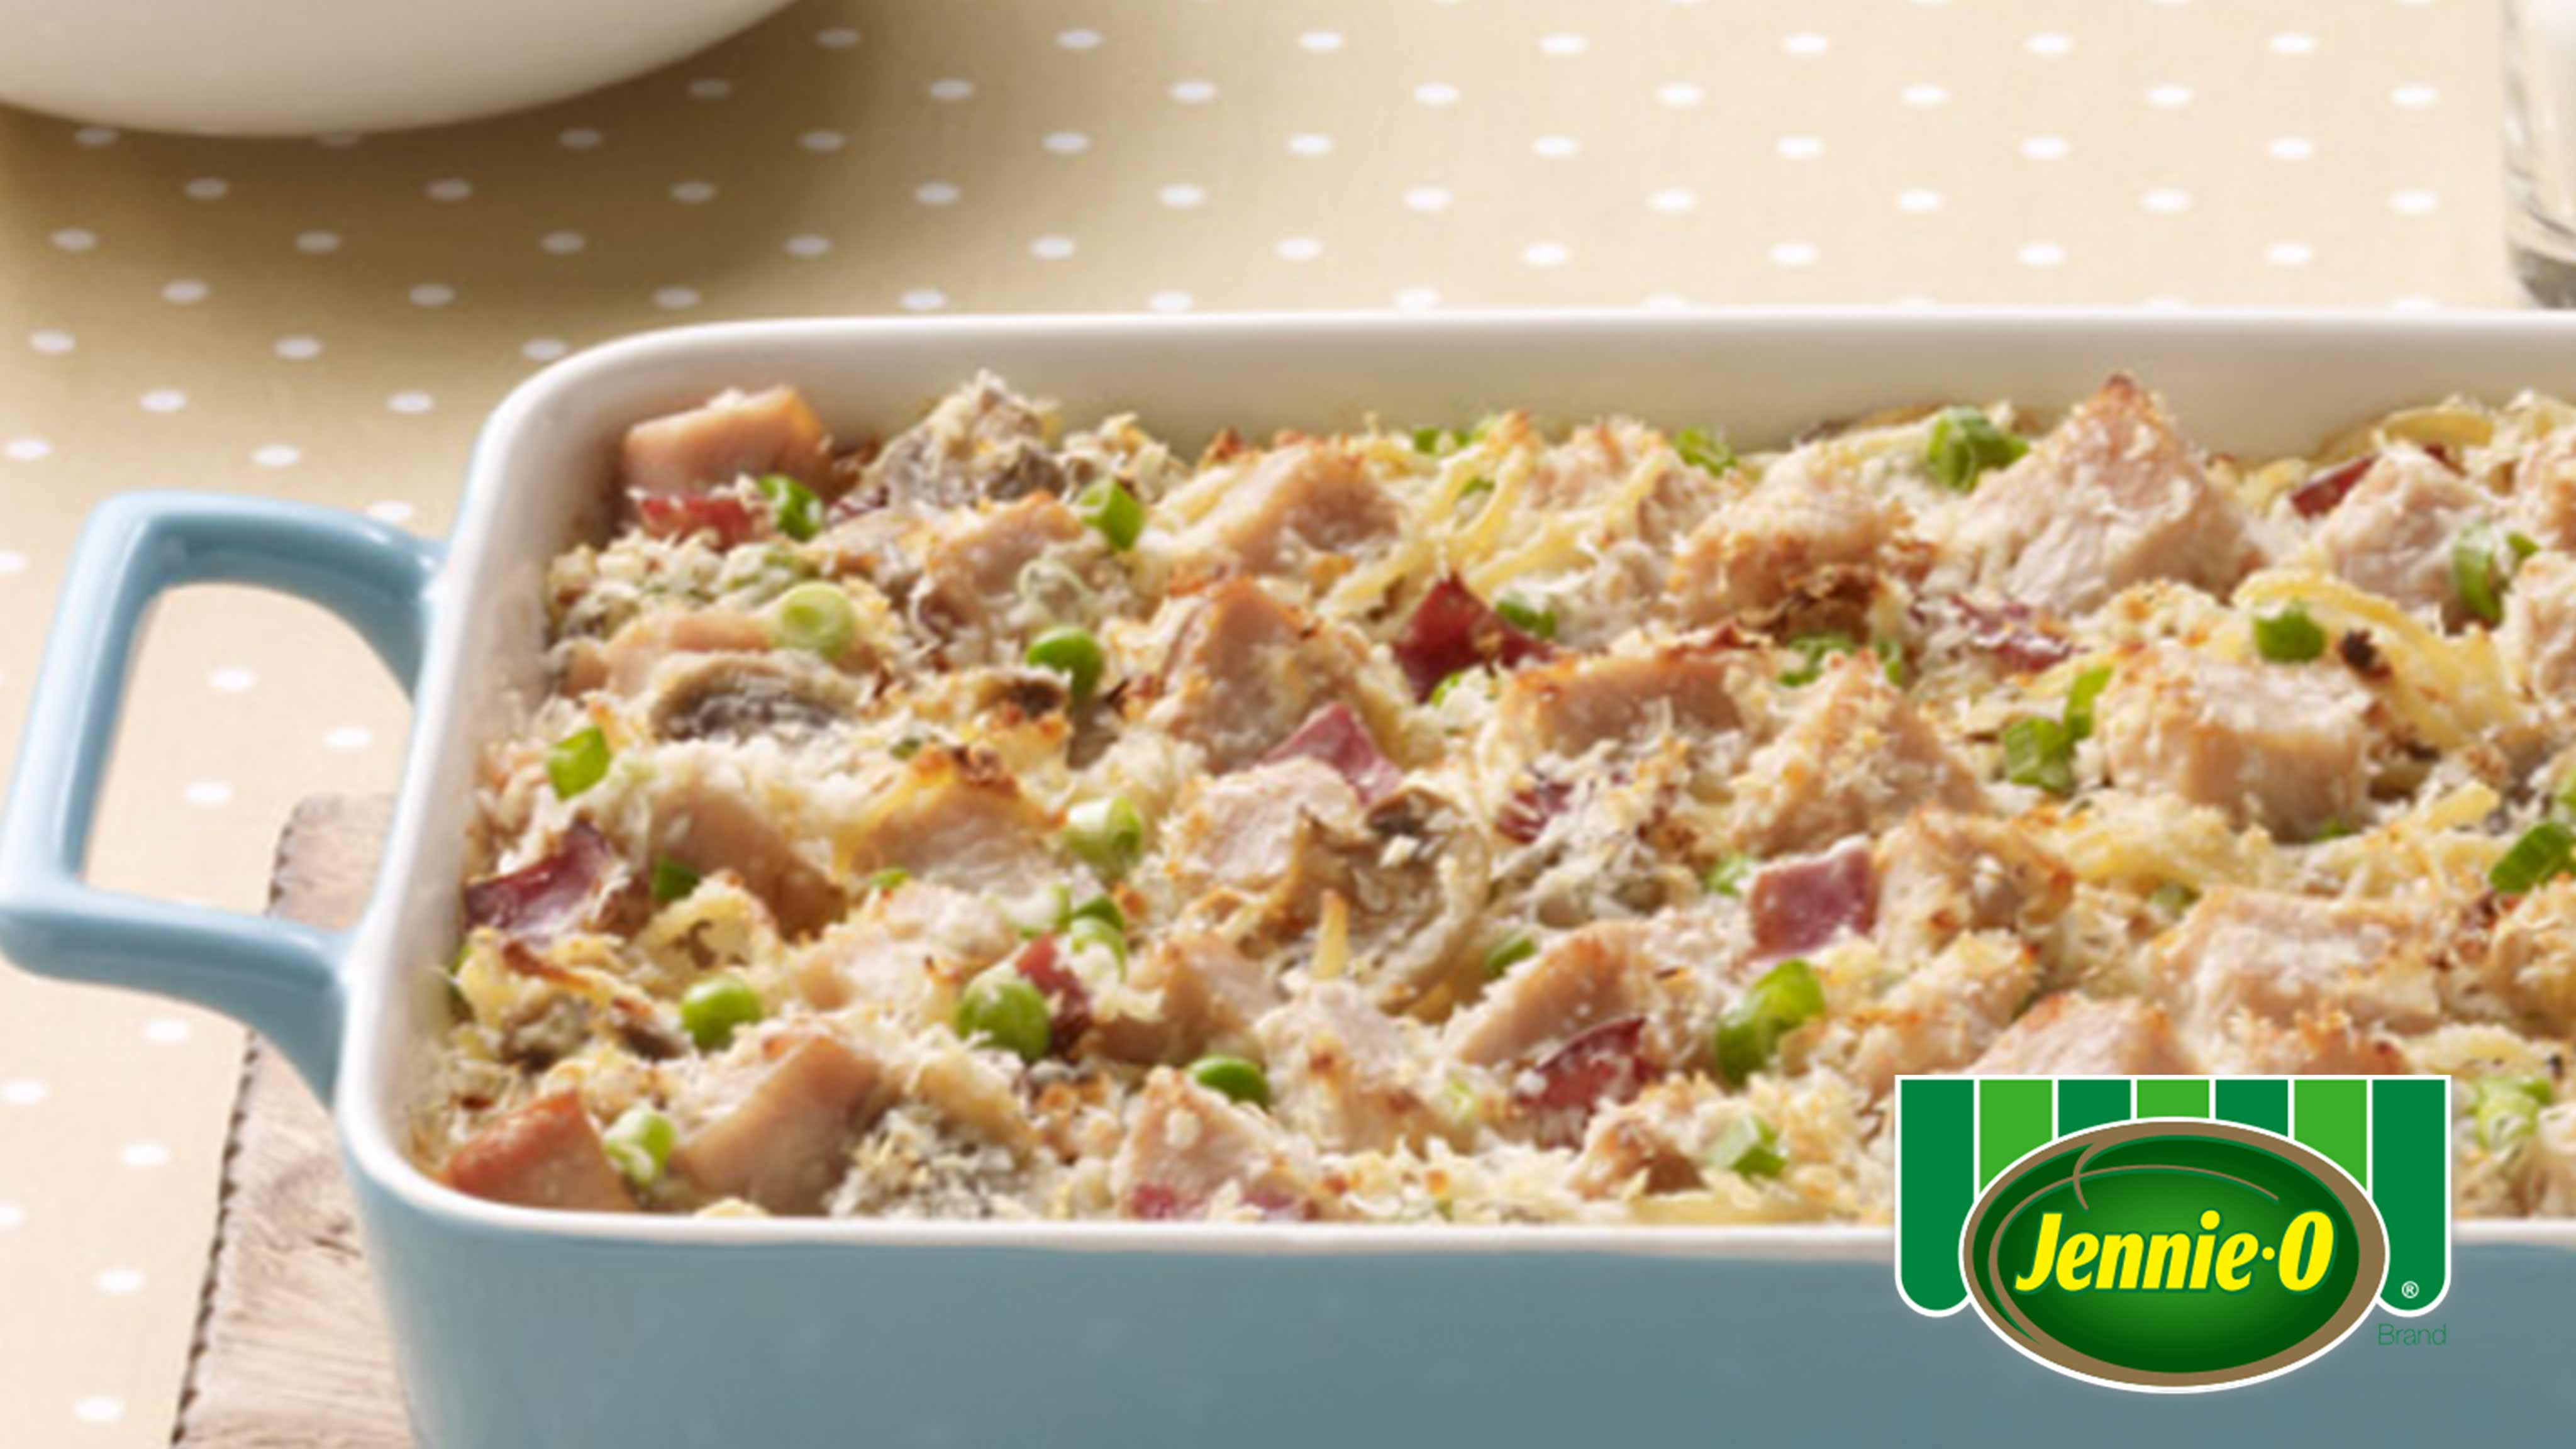 Image for Recipe Best Ever Turkey Tetrazzini